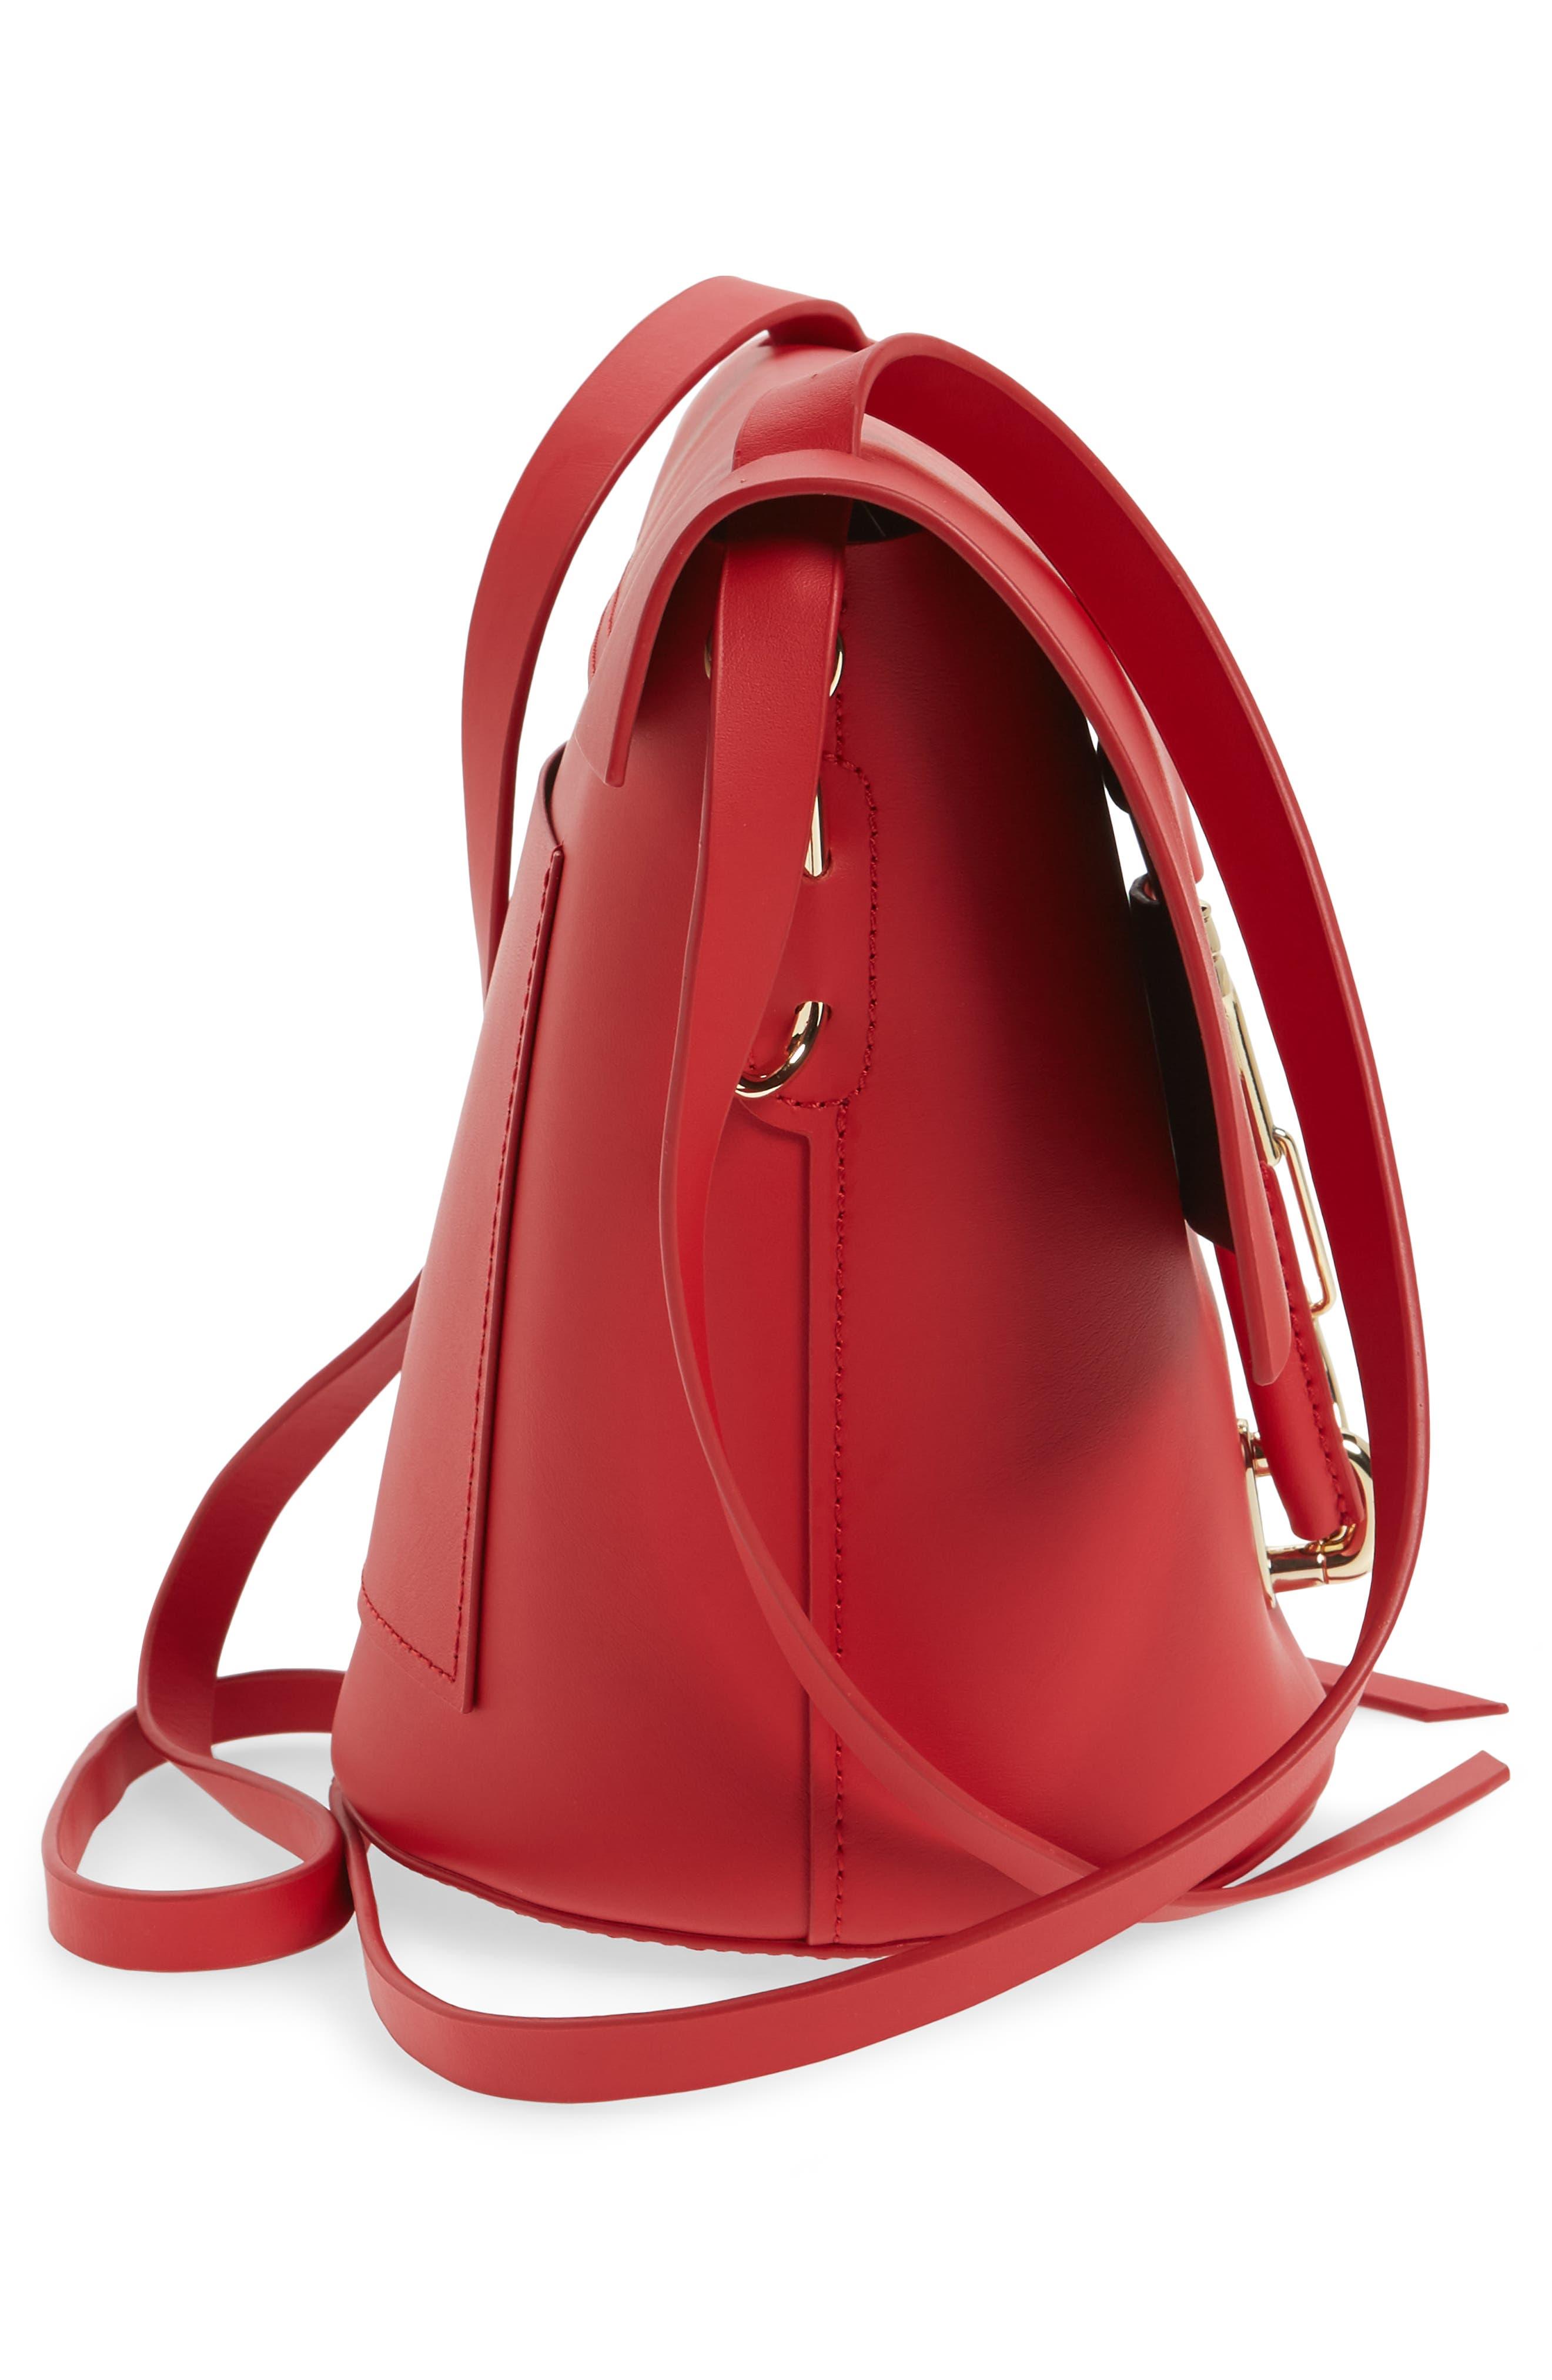 Belay Leather Crossbody Bucket Bag,                             Alternate thumbnail 5, color,                             620